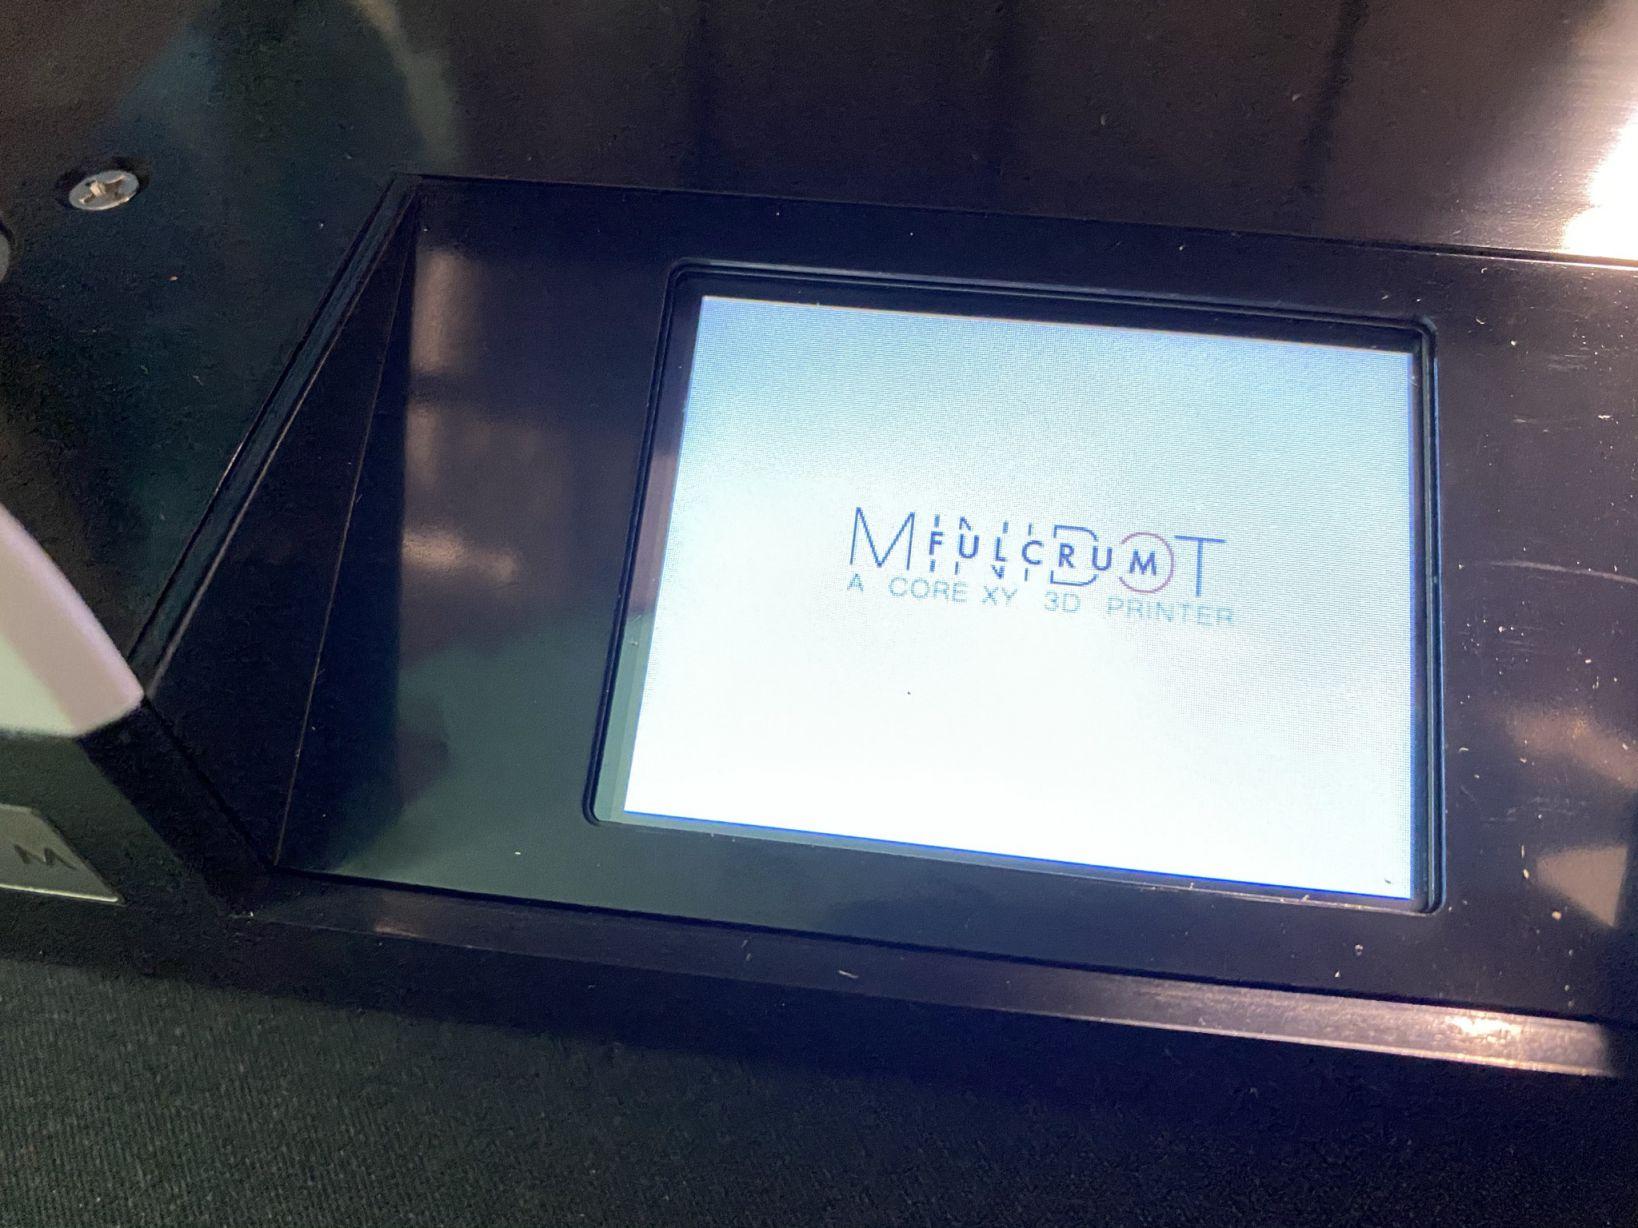 recensione-stampante-3d-flucrum-minibot-16 Recensione FULCRUM MINIBOT, Stampante 3D Facile e Veloce